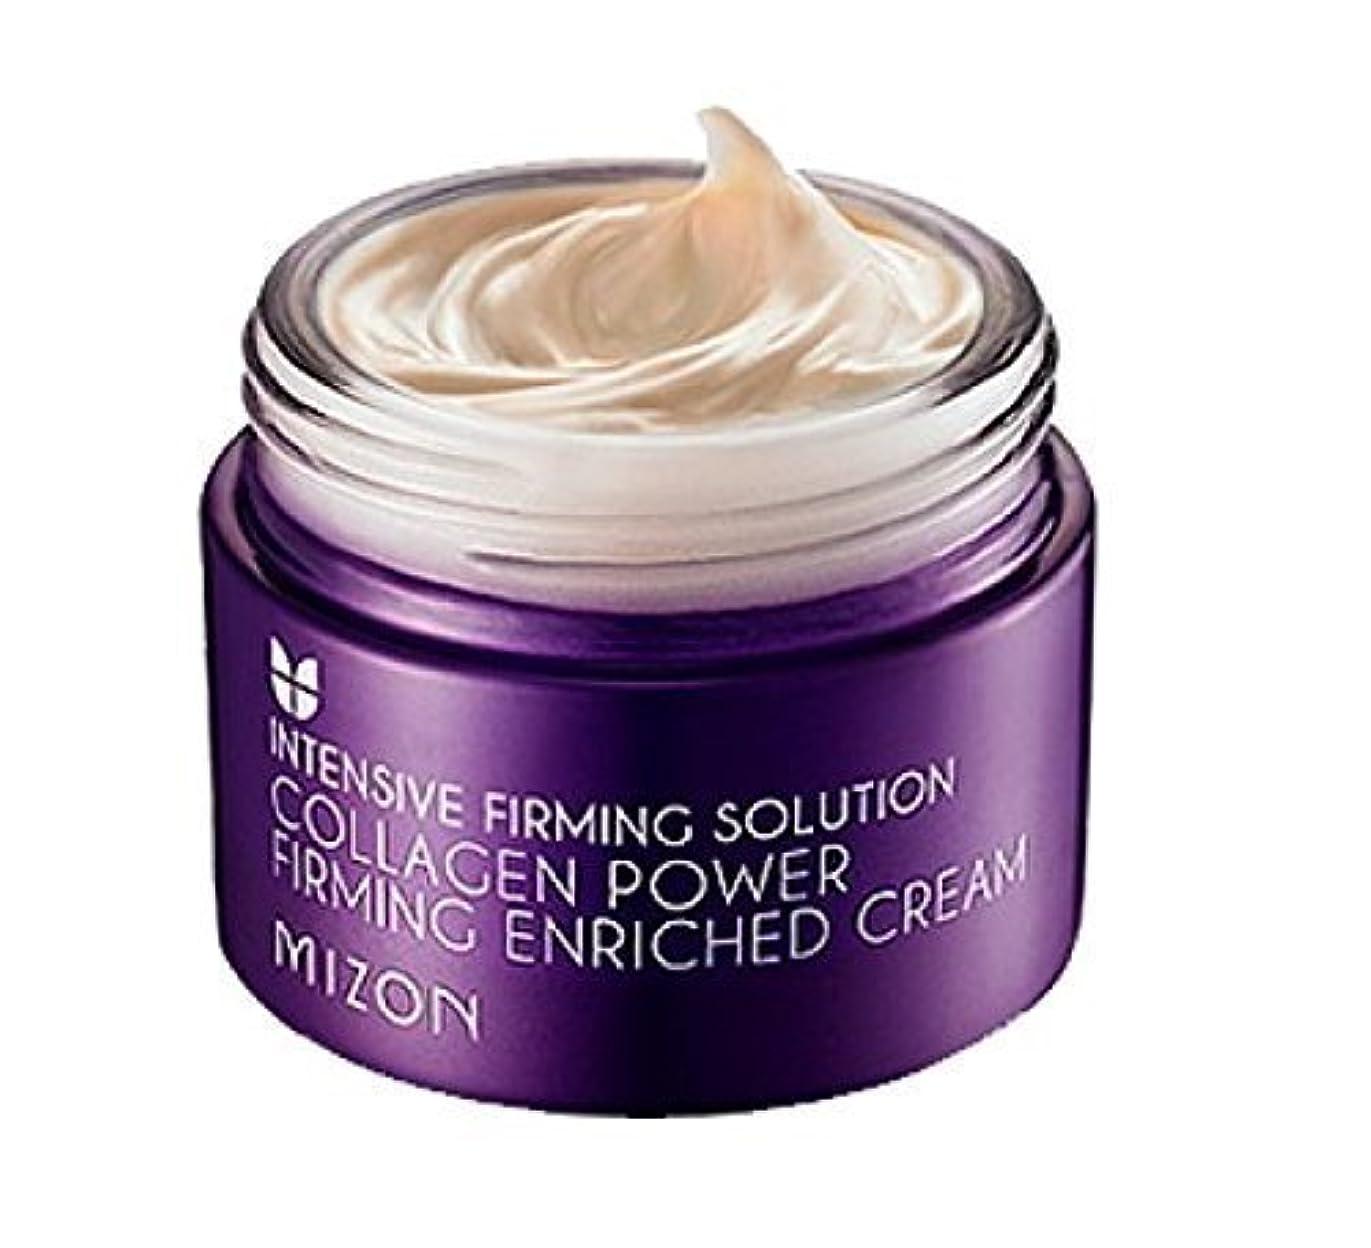 価格毎月二十MIZON Collagen Power Firming Enriched Cream (並行輸入品)